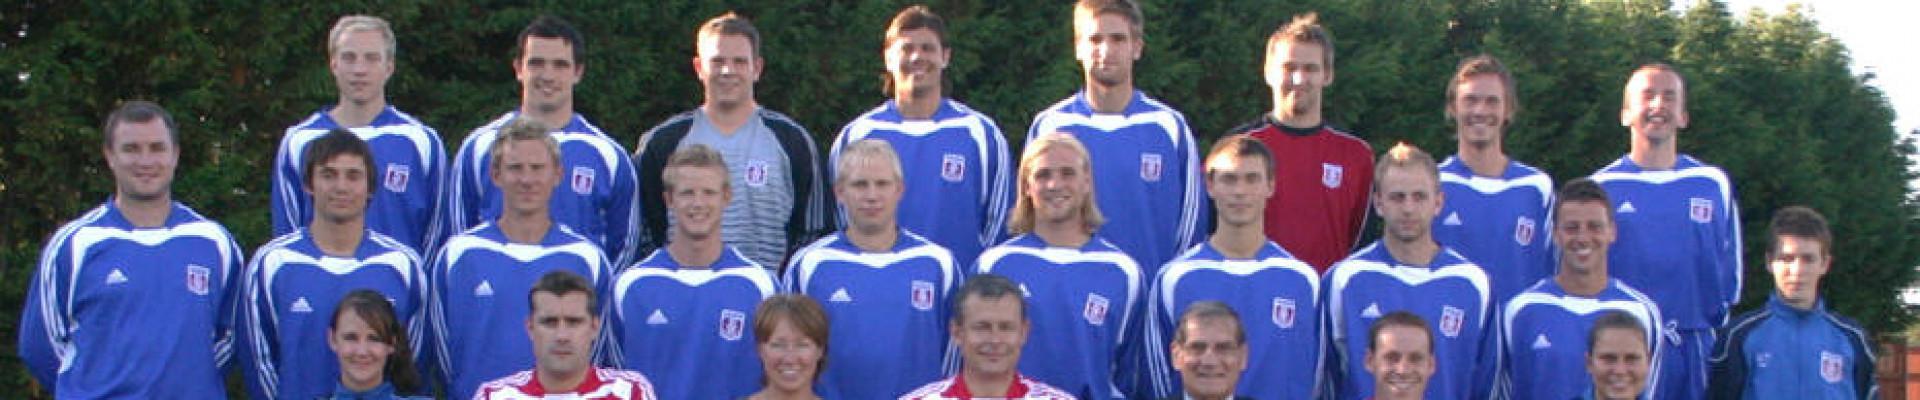 Team Photo 2006/07 Season